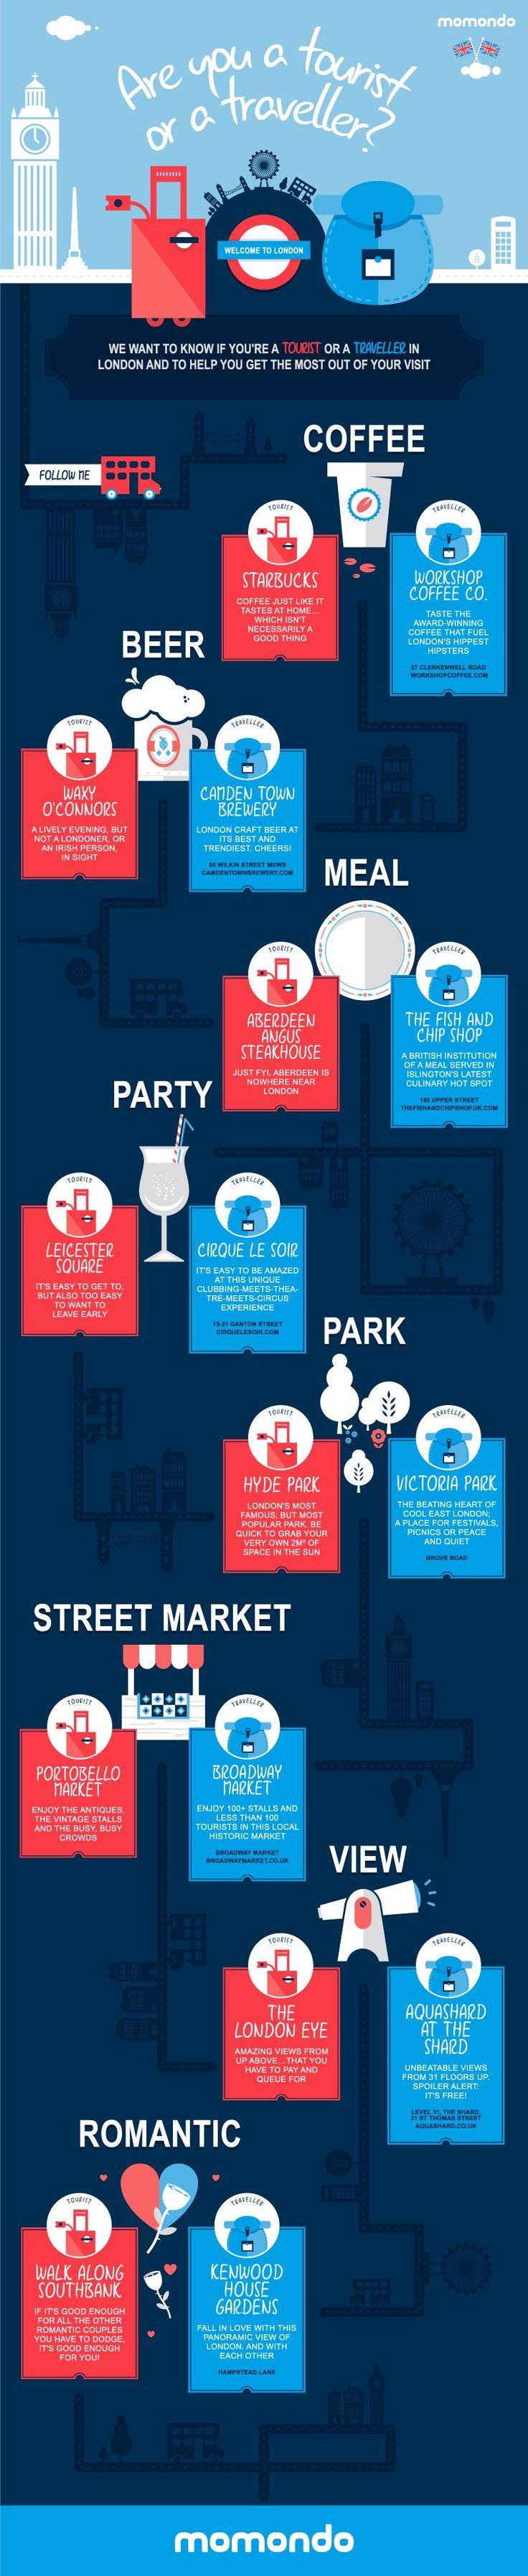 A Fun Look at London. Tourist or Traveller? - worldtravelfamily.com http://finelinedrivingacademy.co.uk